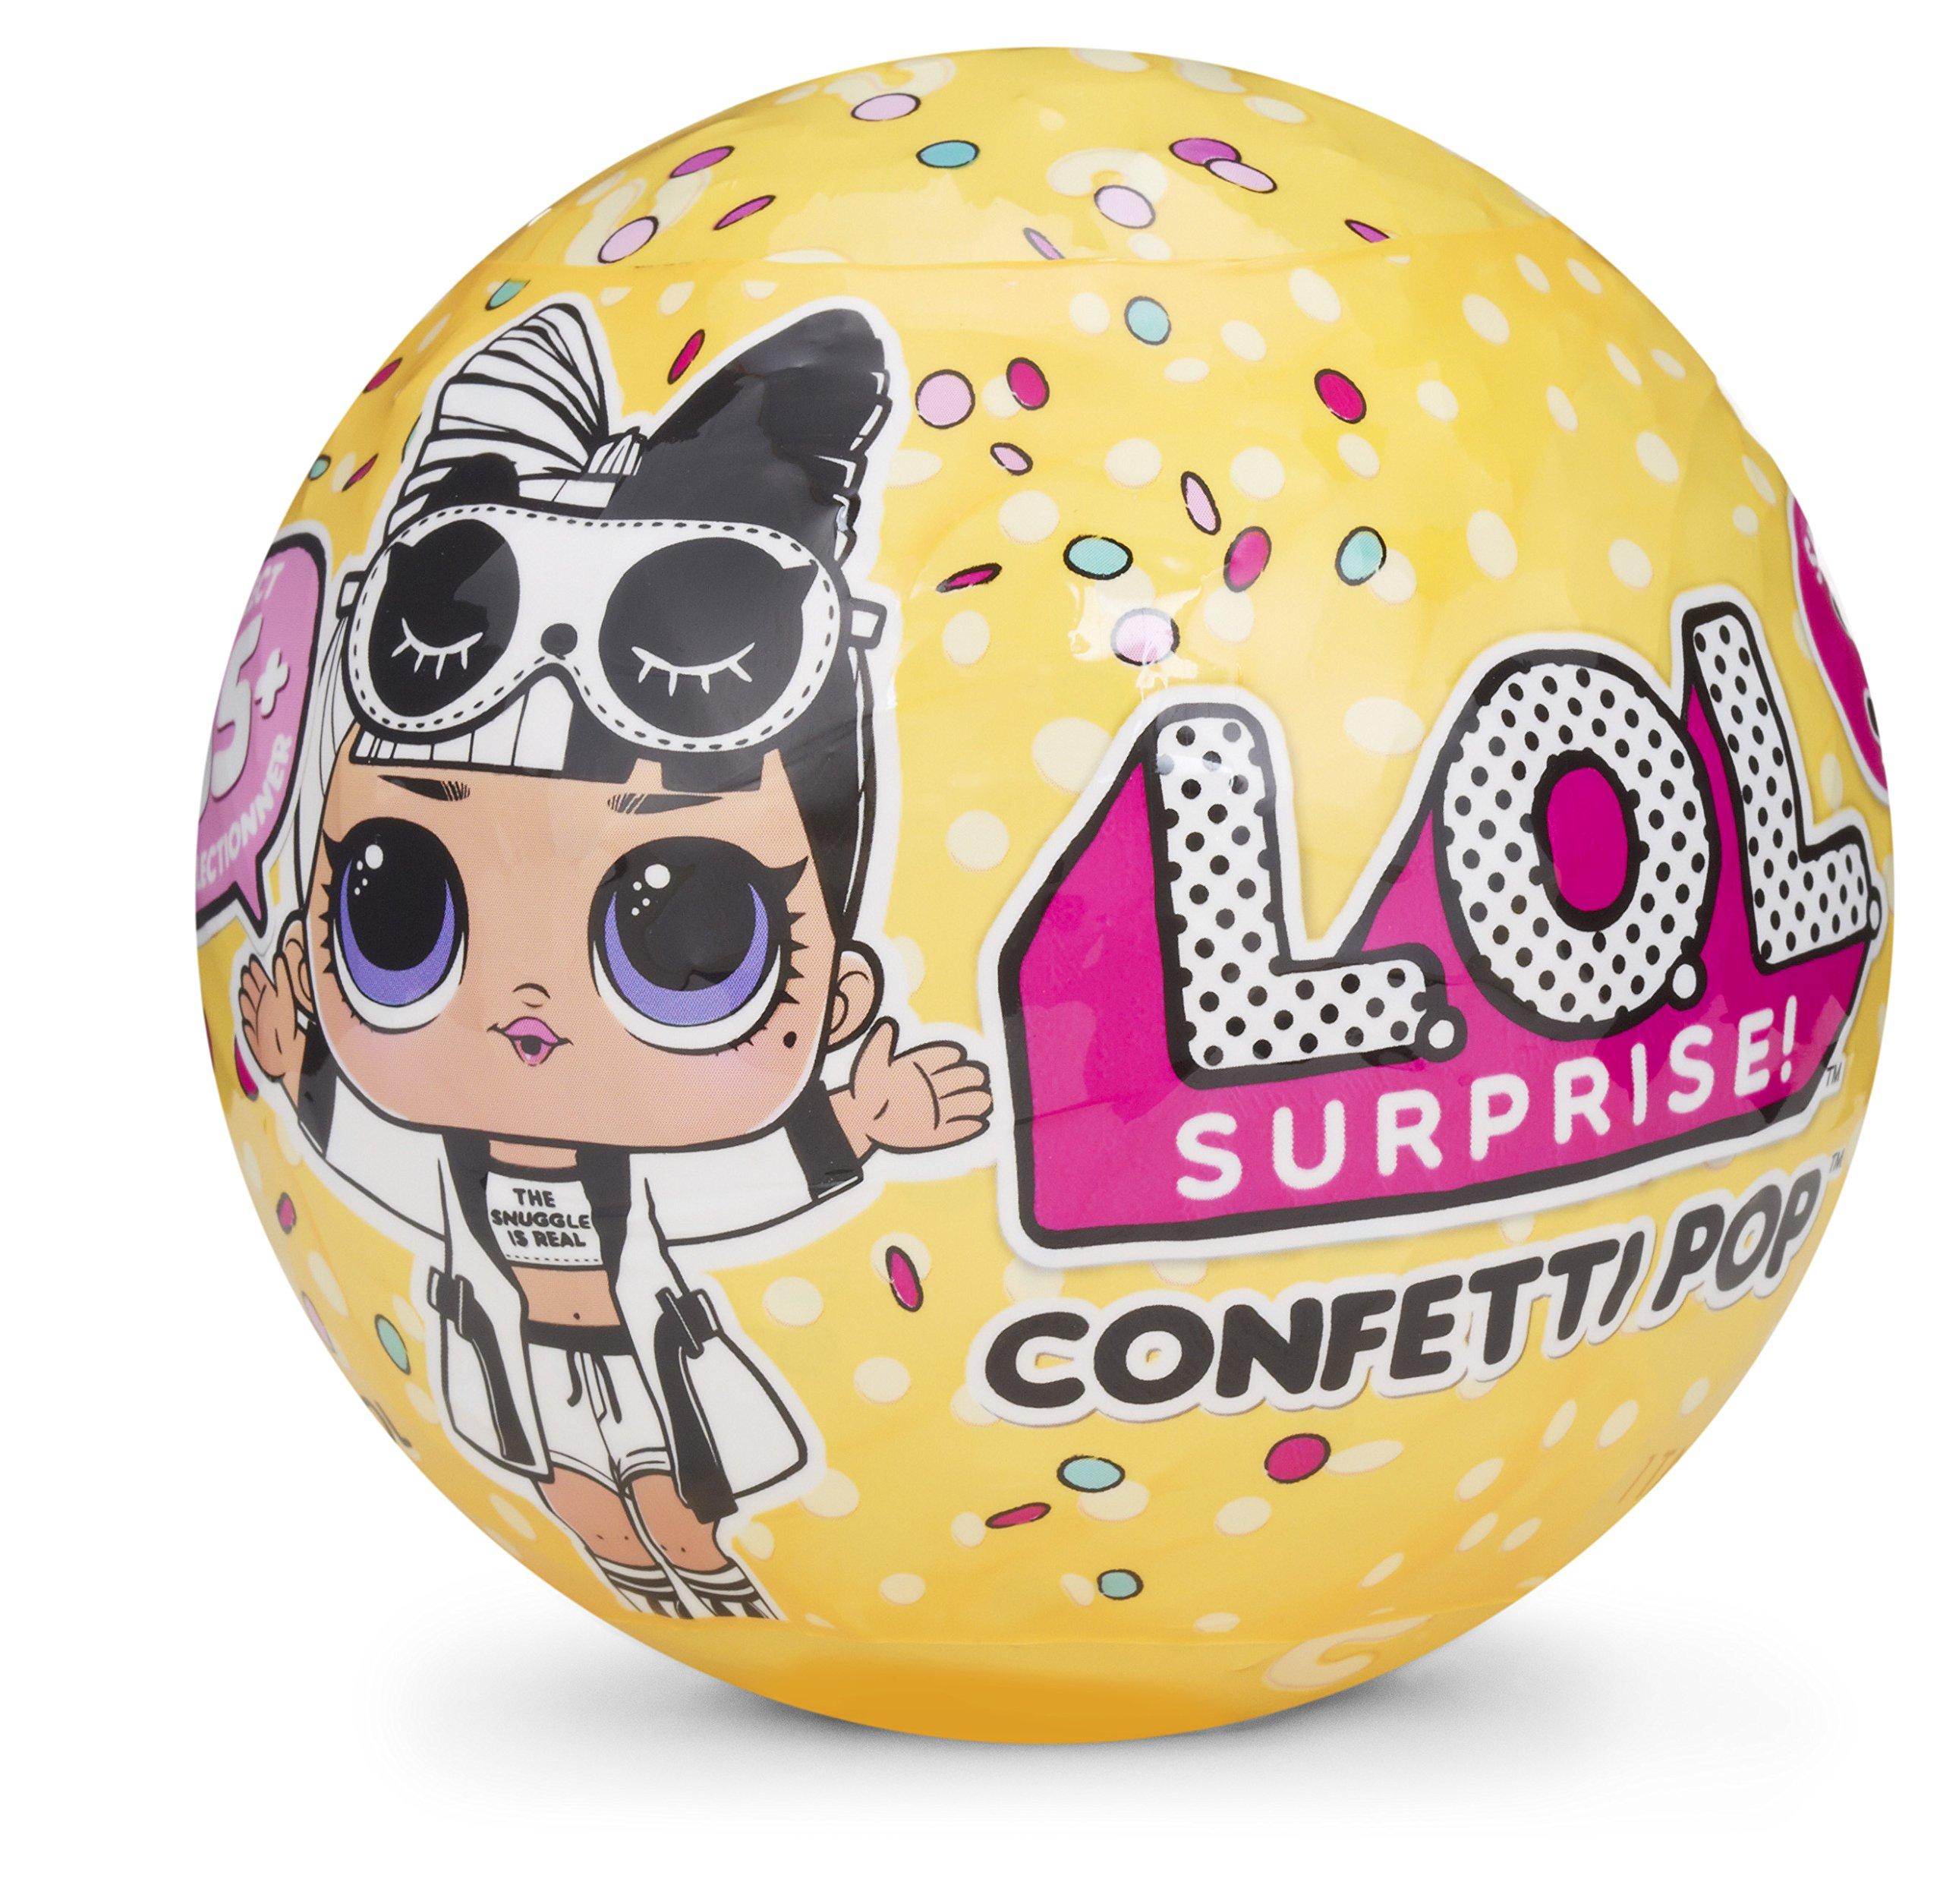 L.O.L 서프라이즈 컨페티팝 시리즈3 인형 L.O.L. Surprise! Confetti Pop - Series 3 Collectible Dolls,Blue